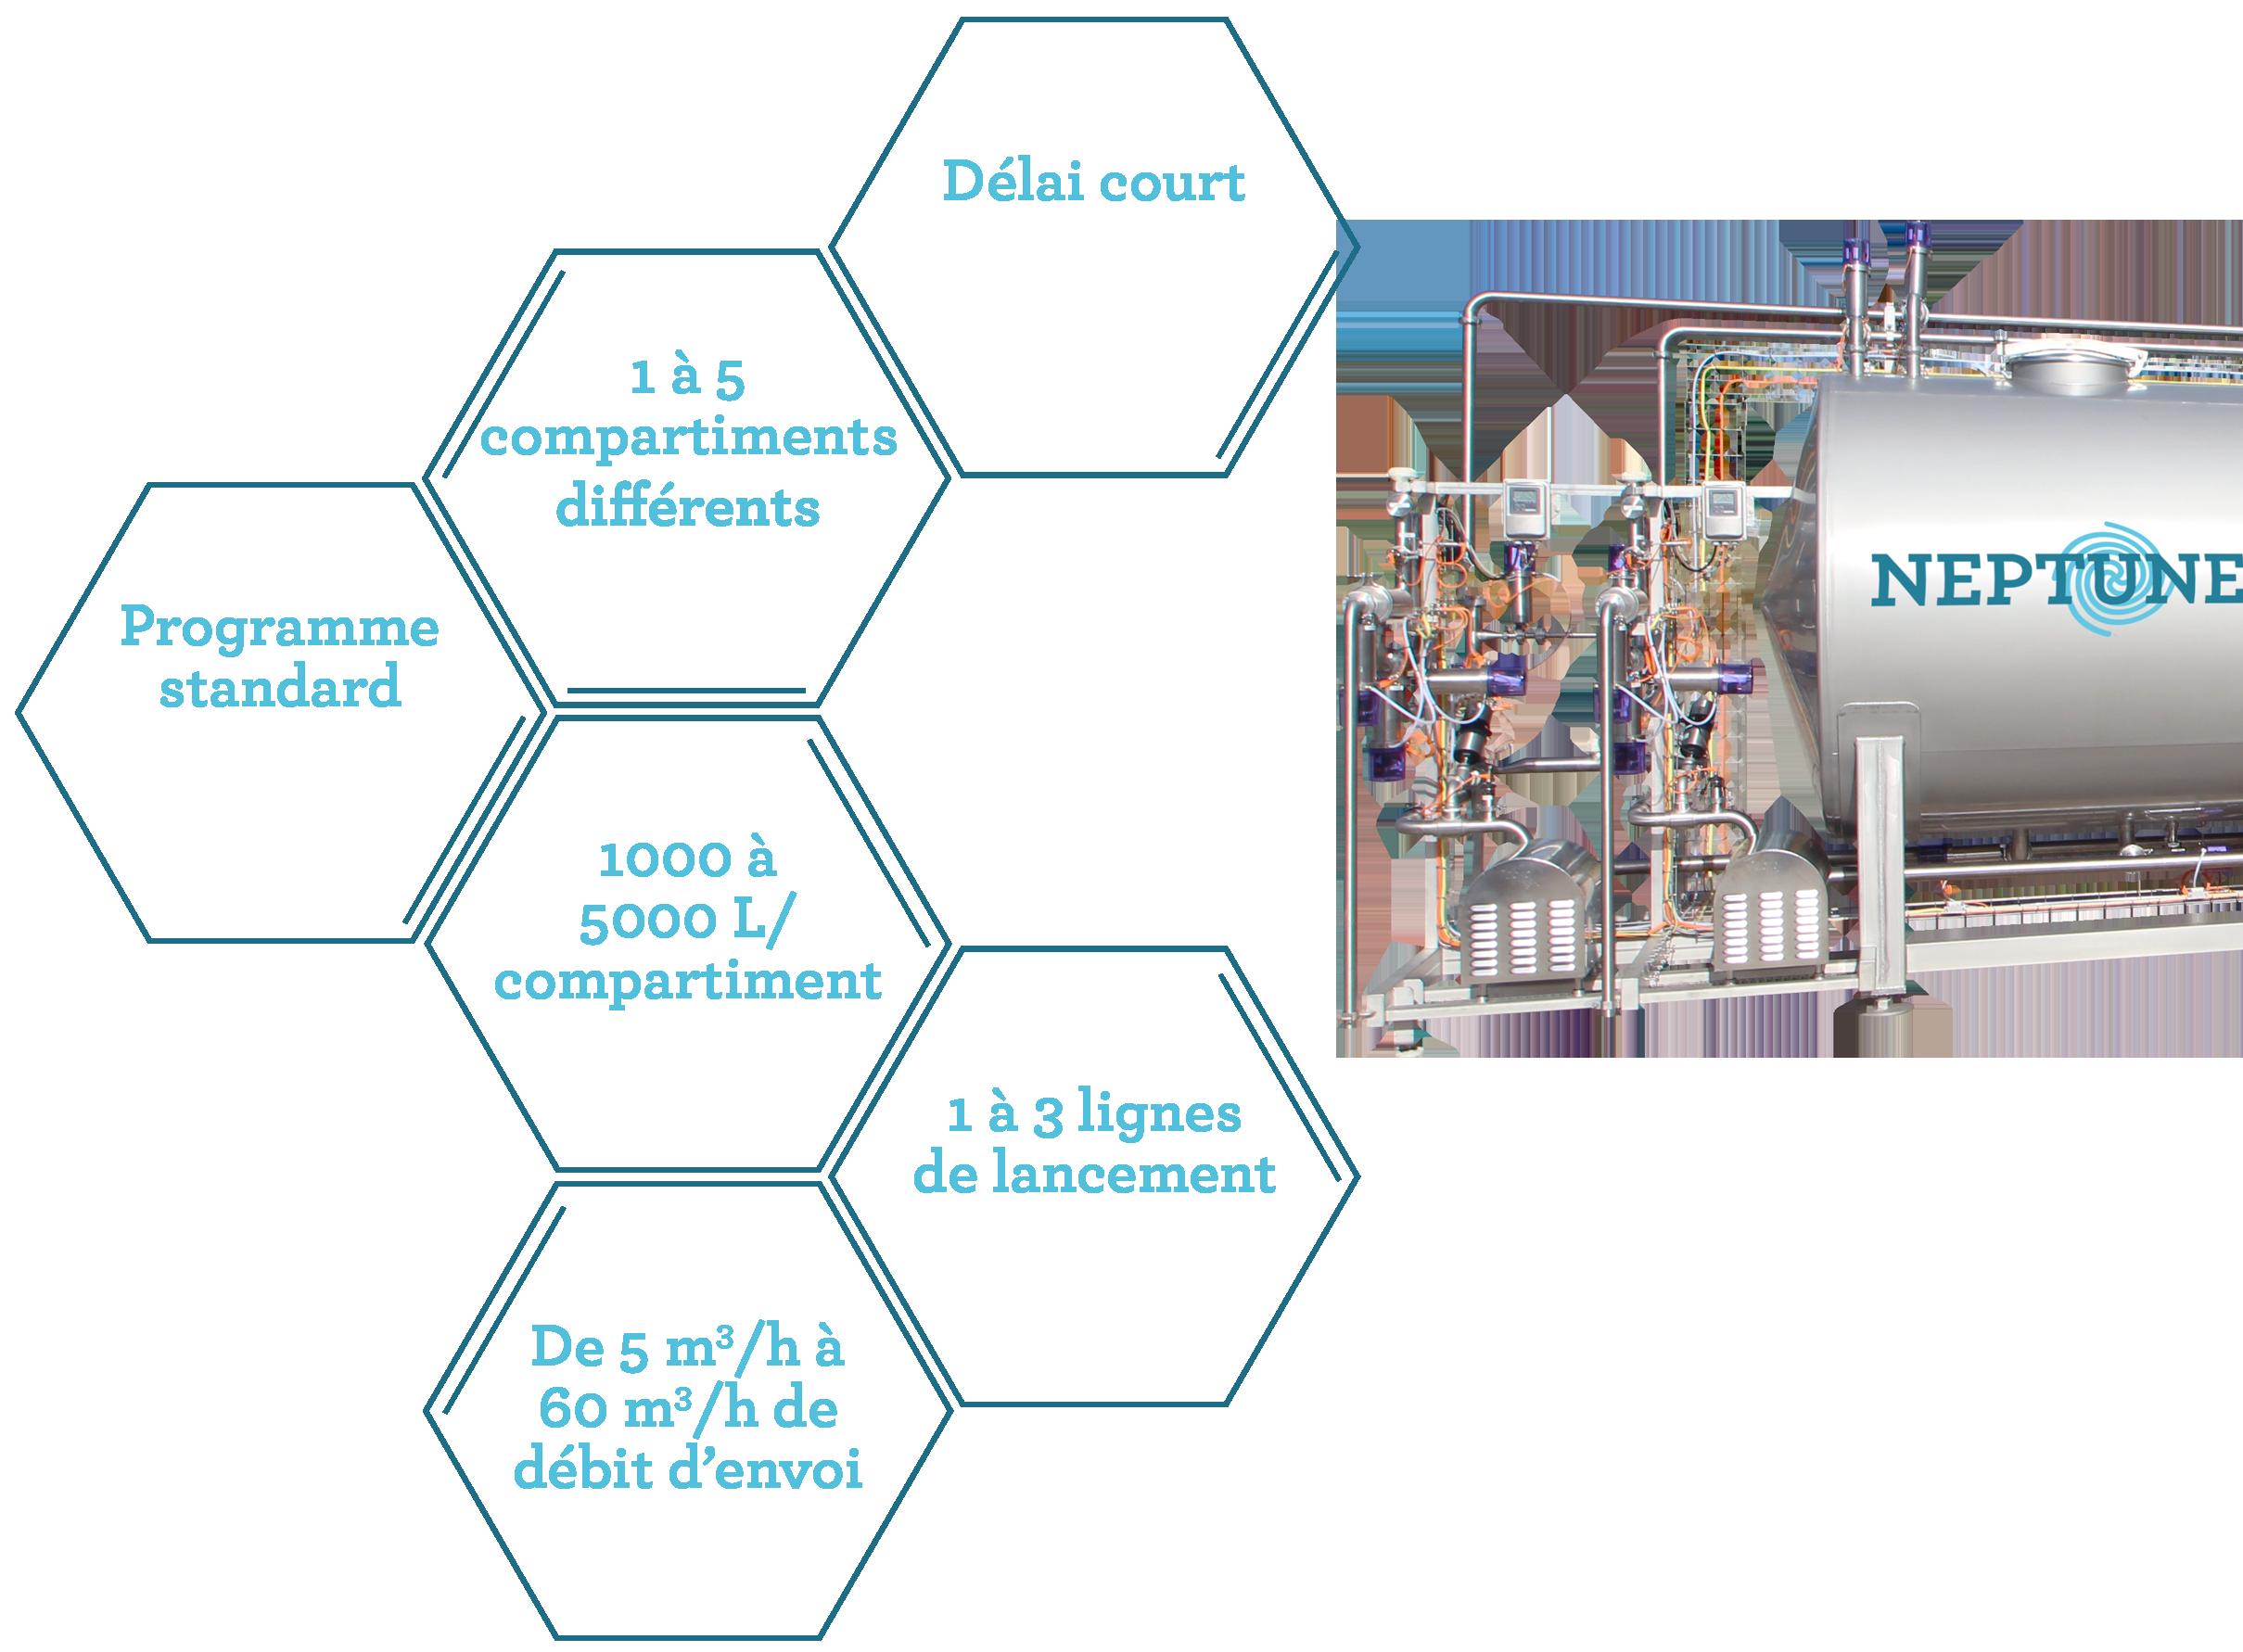 Nettoyage NEP CIP NEPTUNE compacte standard